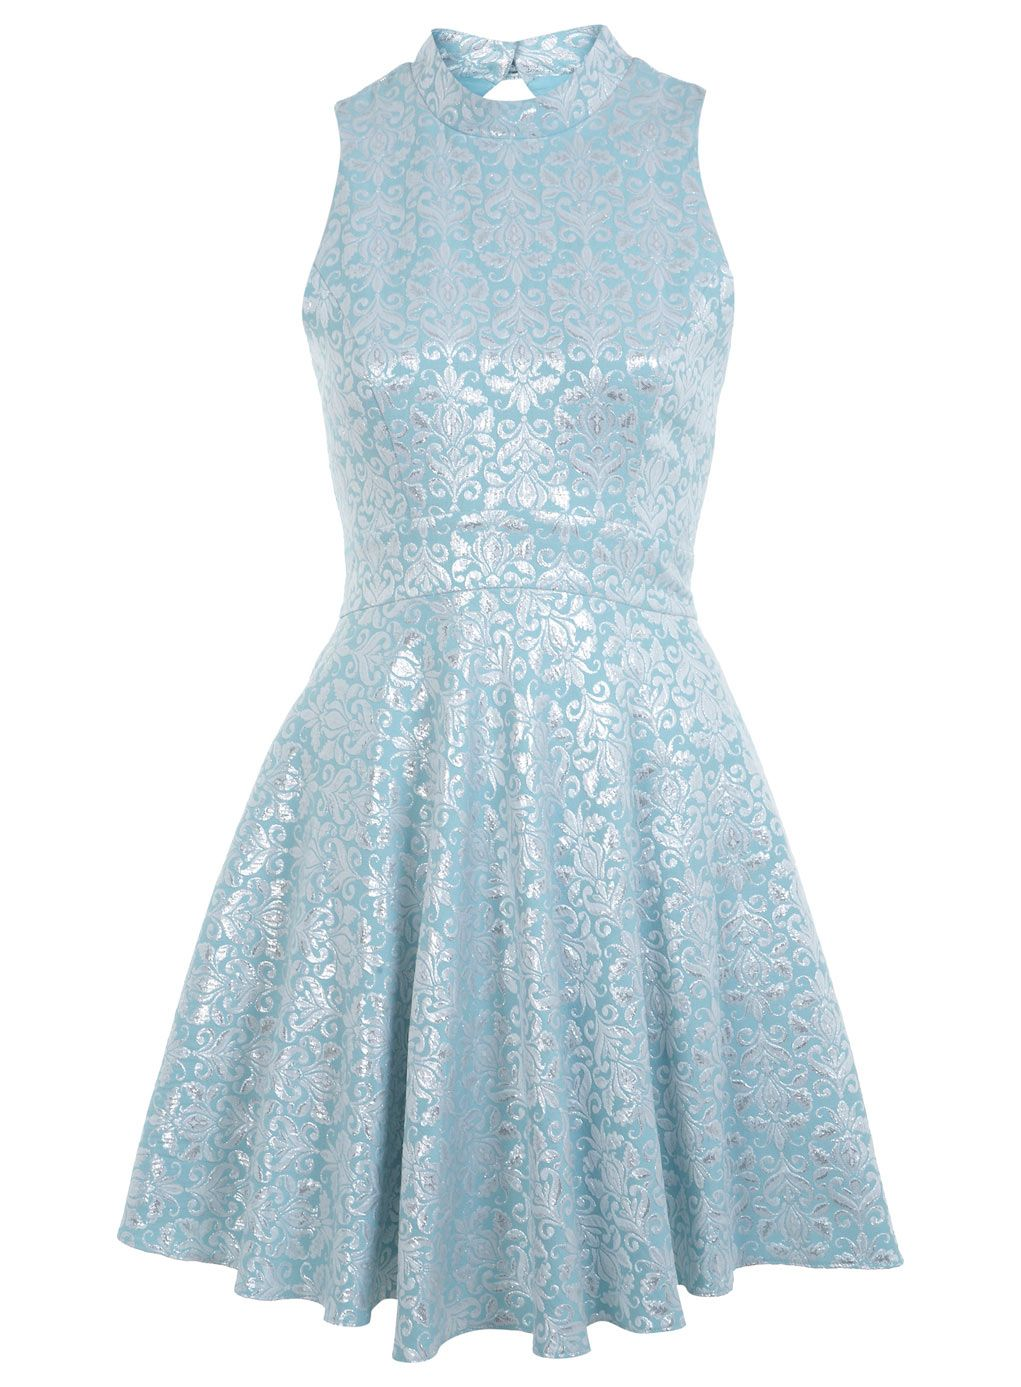 Miss Selfridge High Neck Silver Jacquard Dress | Fashion | Pinterest ...